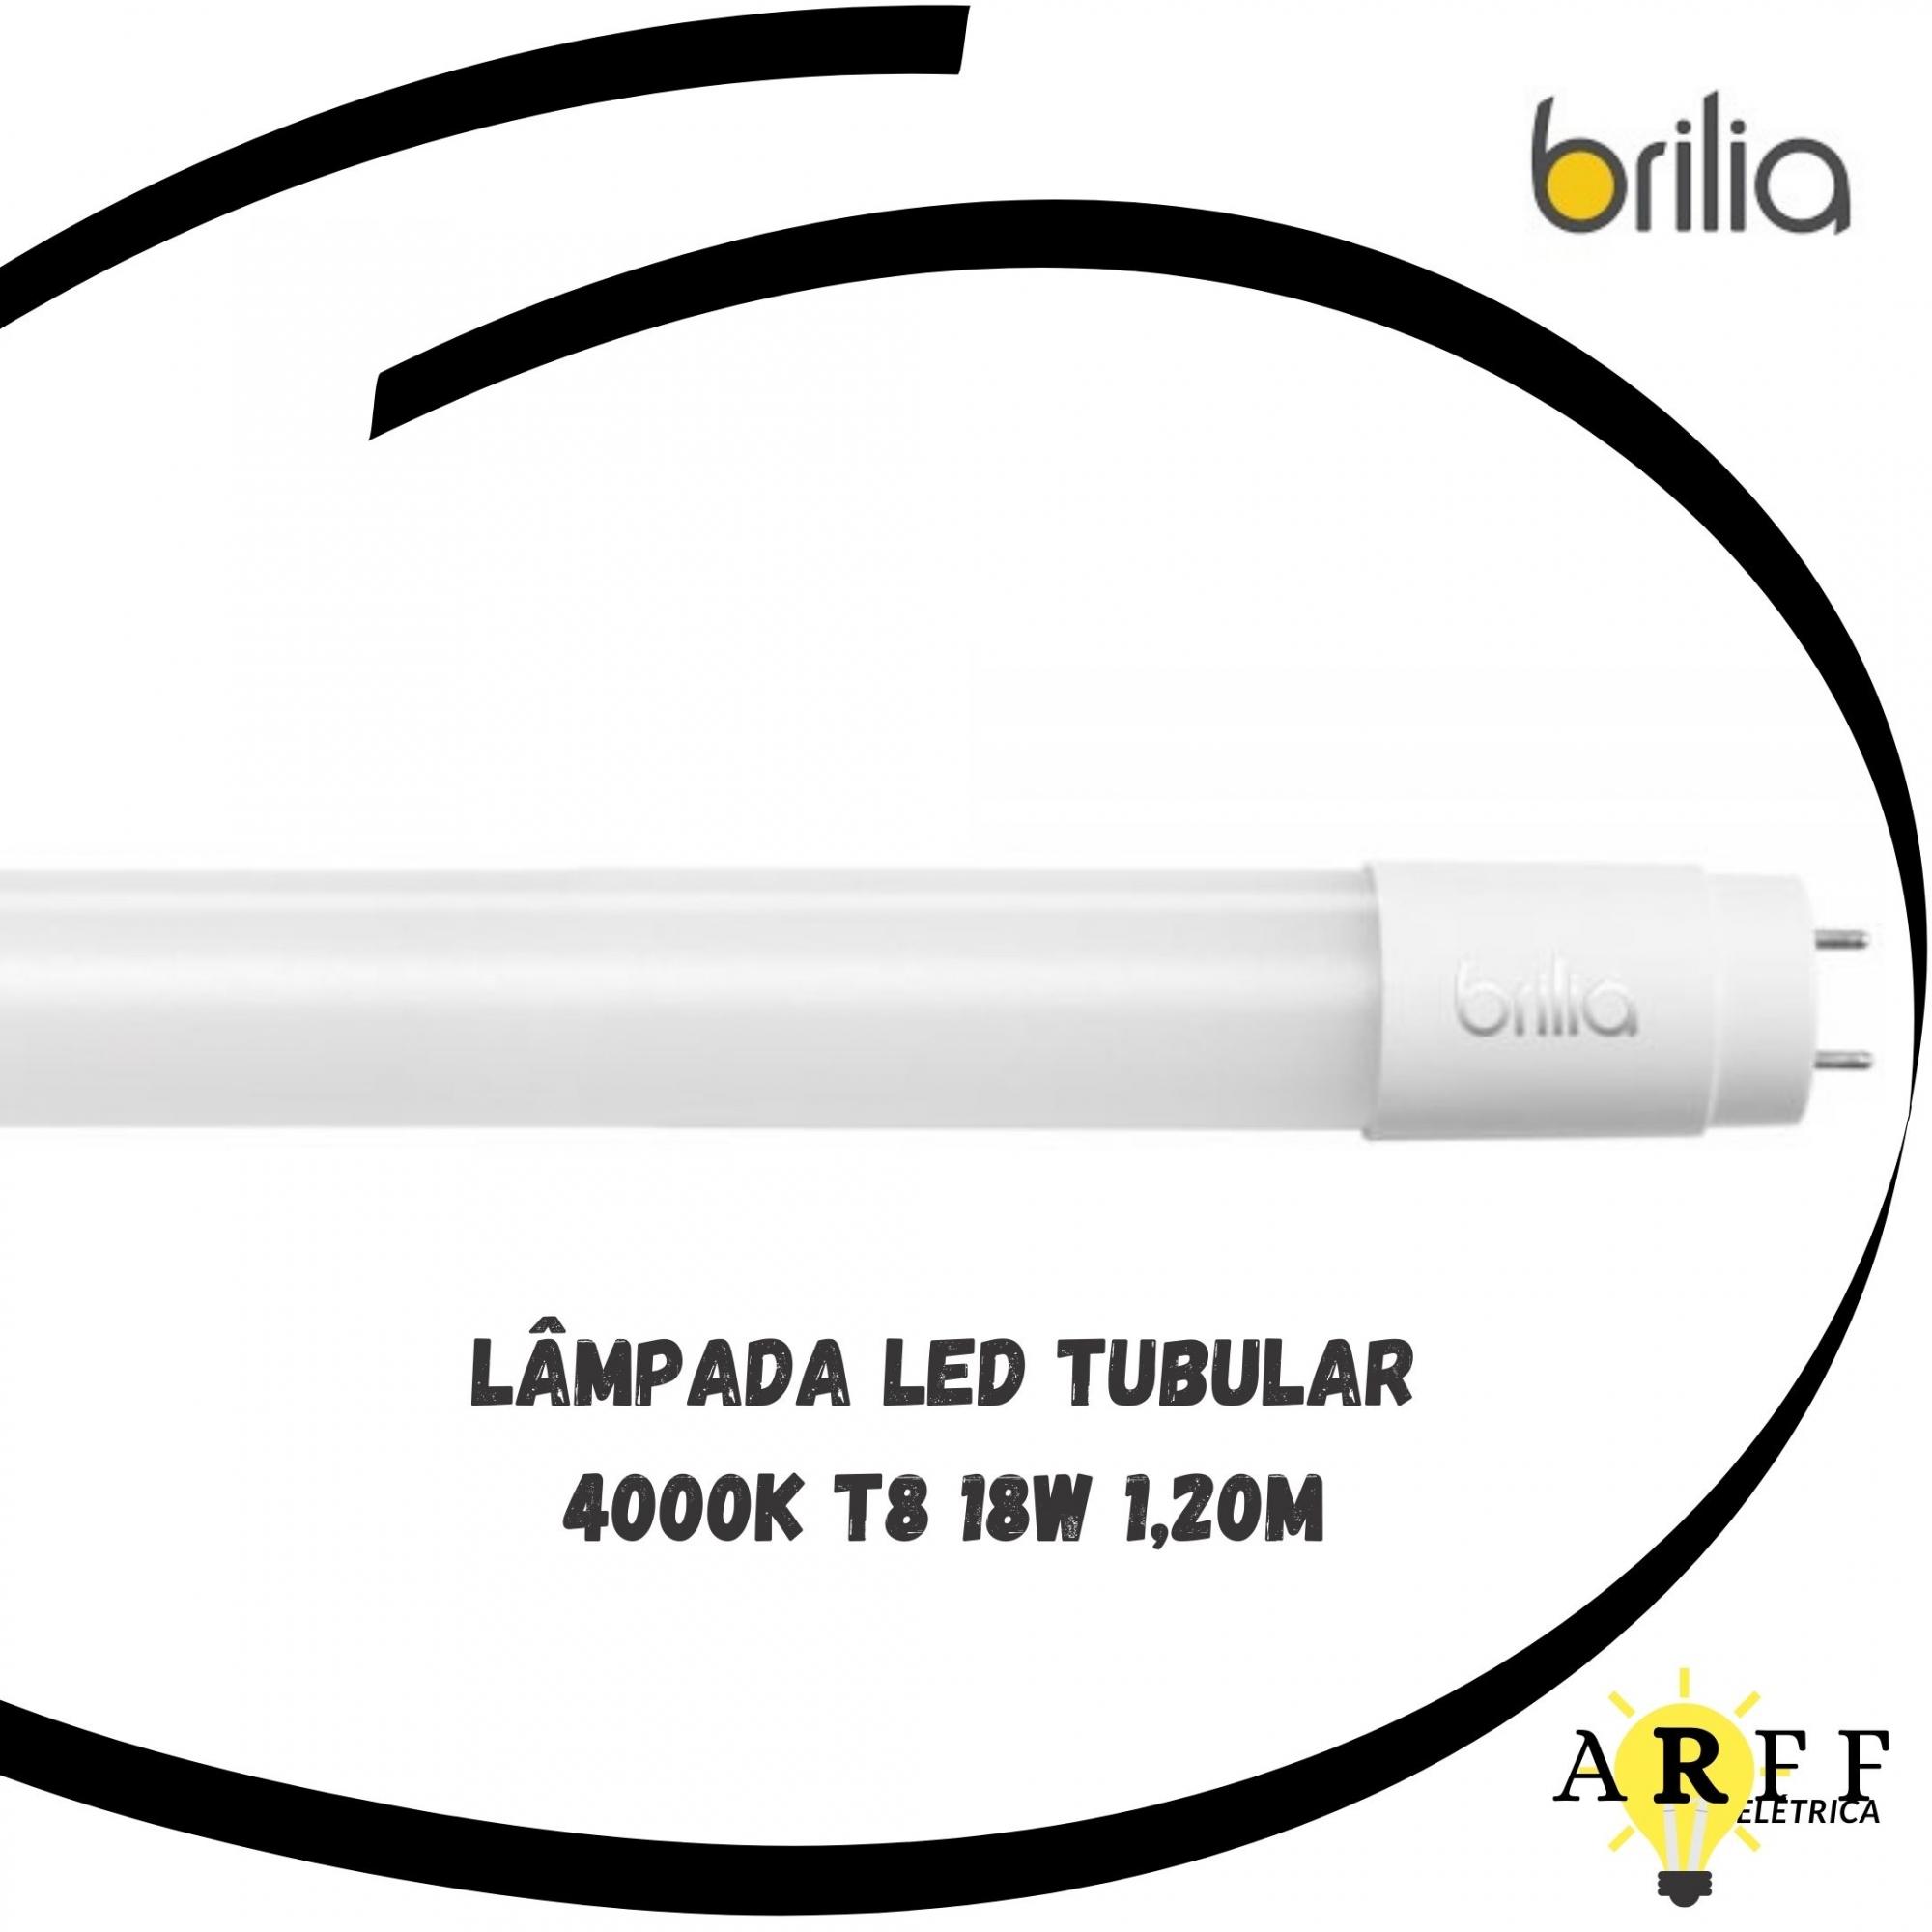 Lâmpada Tubular LED T8 4000K 18W 1,20m BRILIA